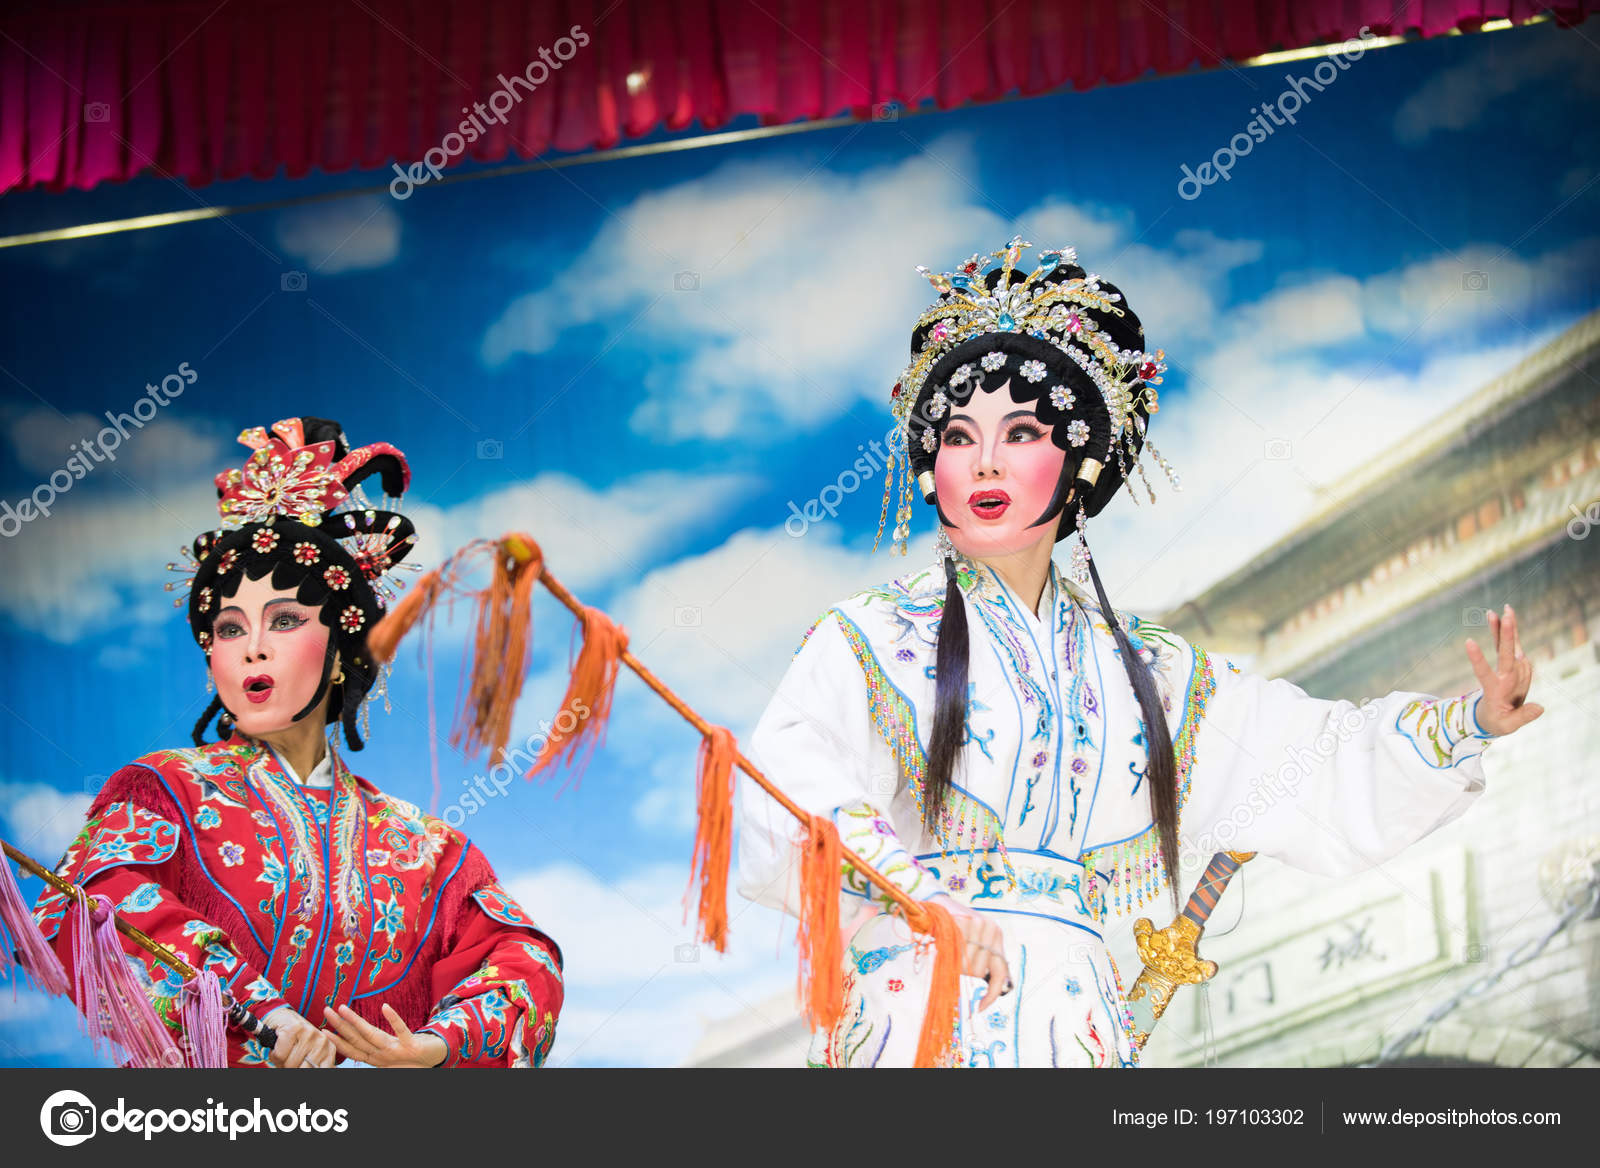 Bangkok Thailand April 2018 Actor Make Performance Chinese